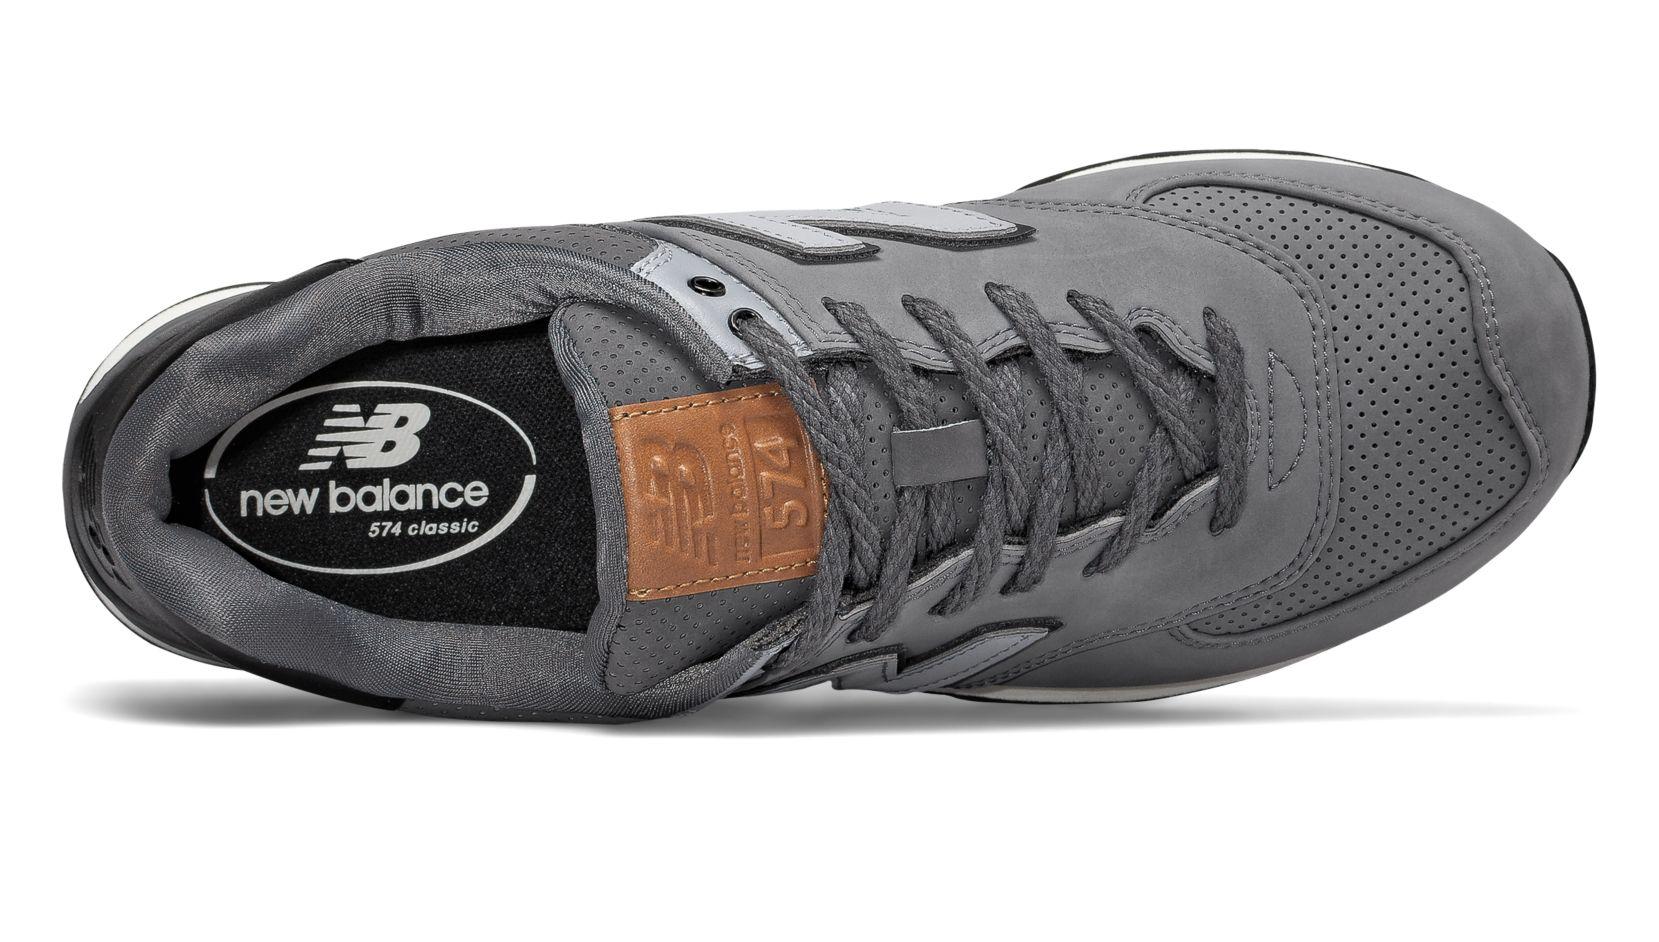 Balance Uomo Grigio New Ml574gpb Sneakers Iaverone SqR8wW5 6b58ca0e1d3